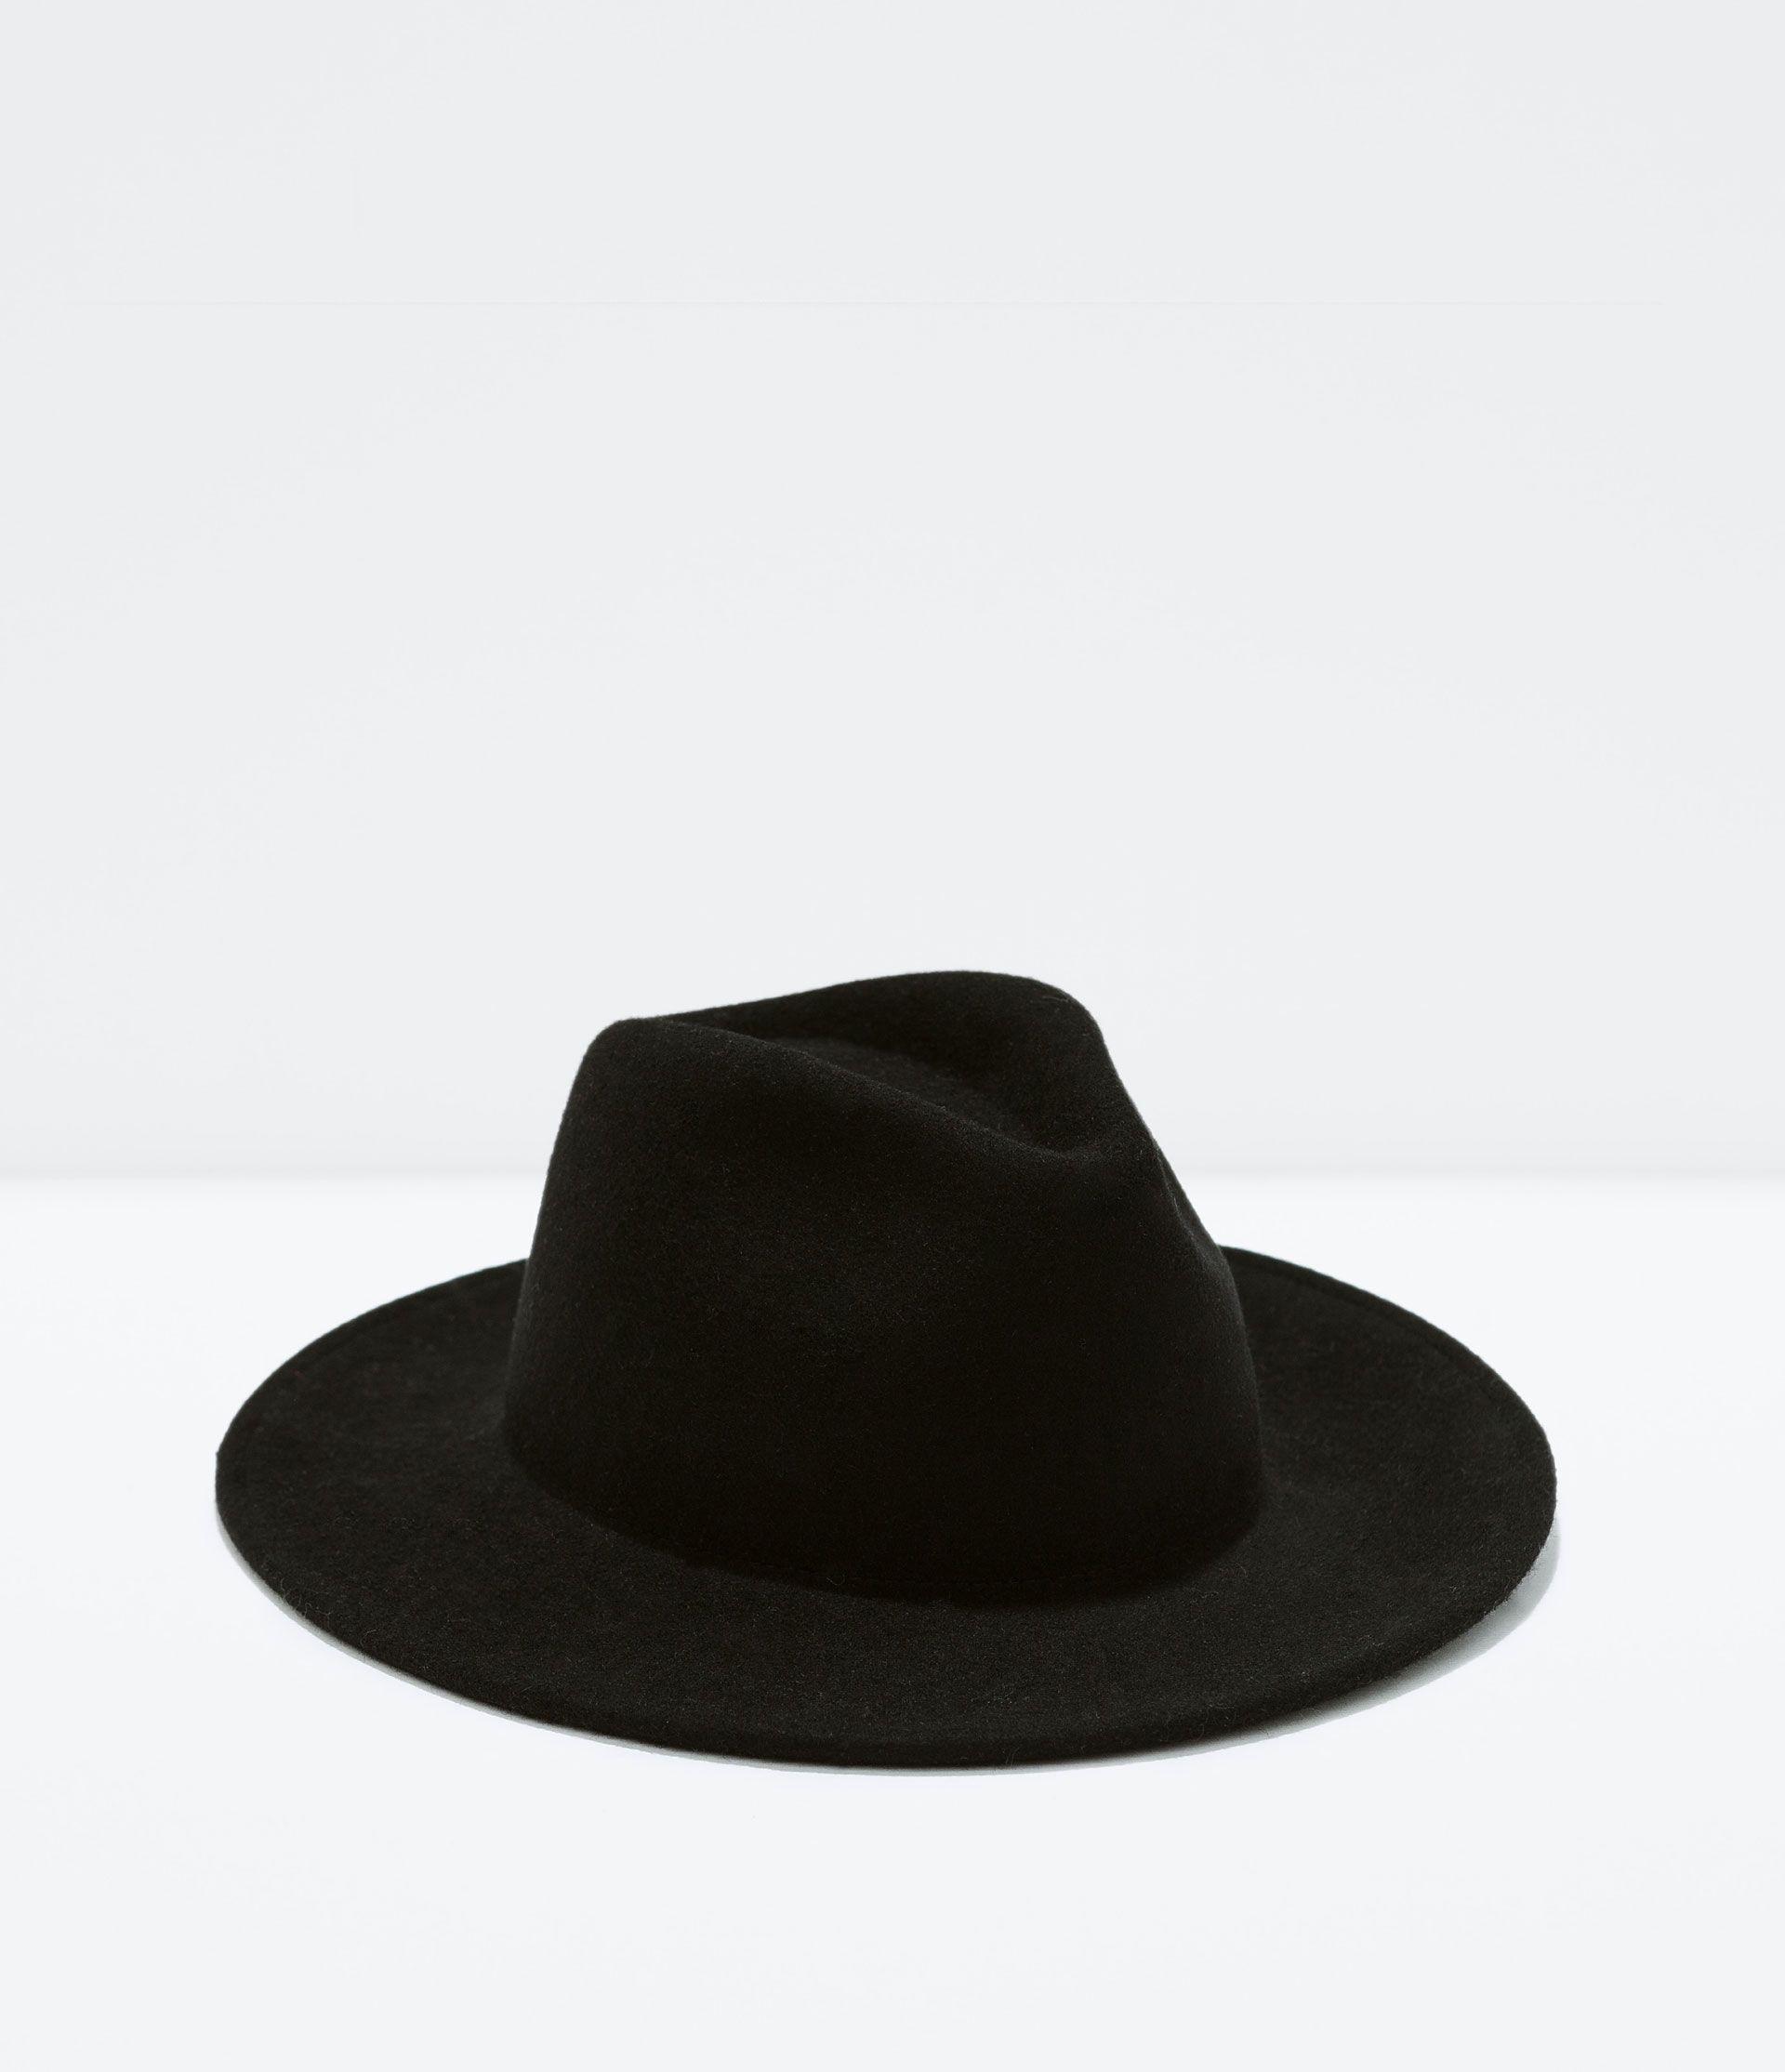 Wide Brim Felt Hat Man New This Week Zara United States Hipster Mens Fashion Wide Brim Felt Hat Hats For Men